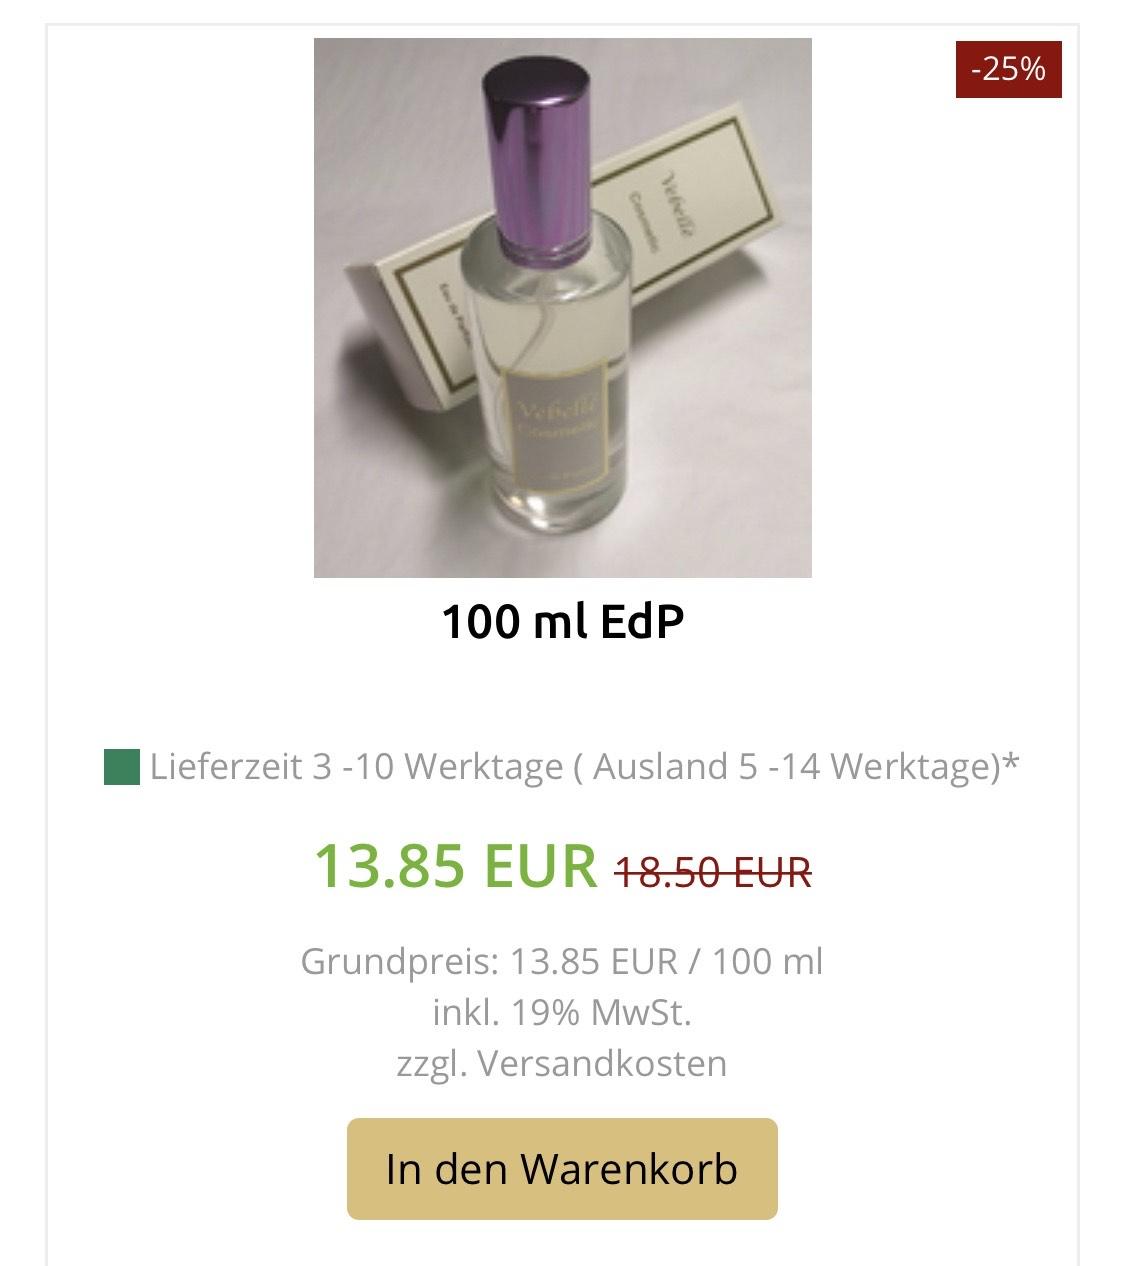 Creed Aventus Eau de Parfum ' Original in 40721 Hilden für